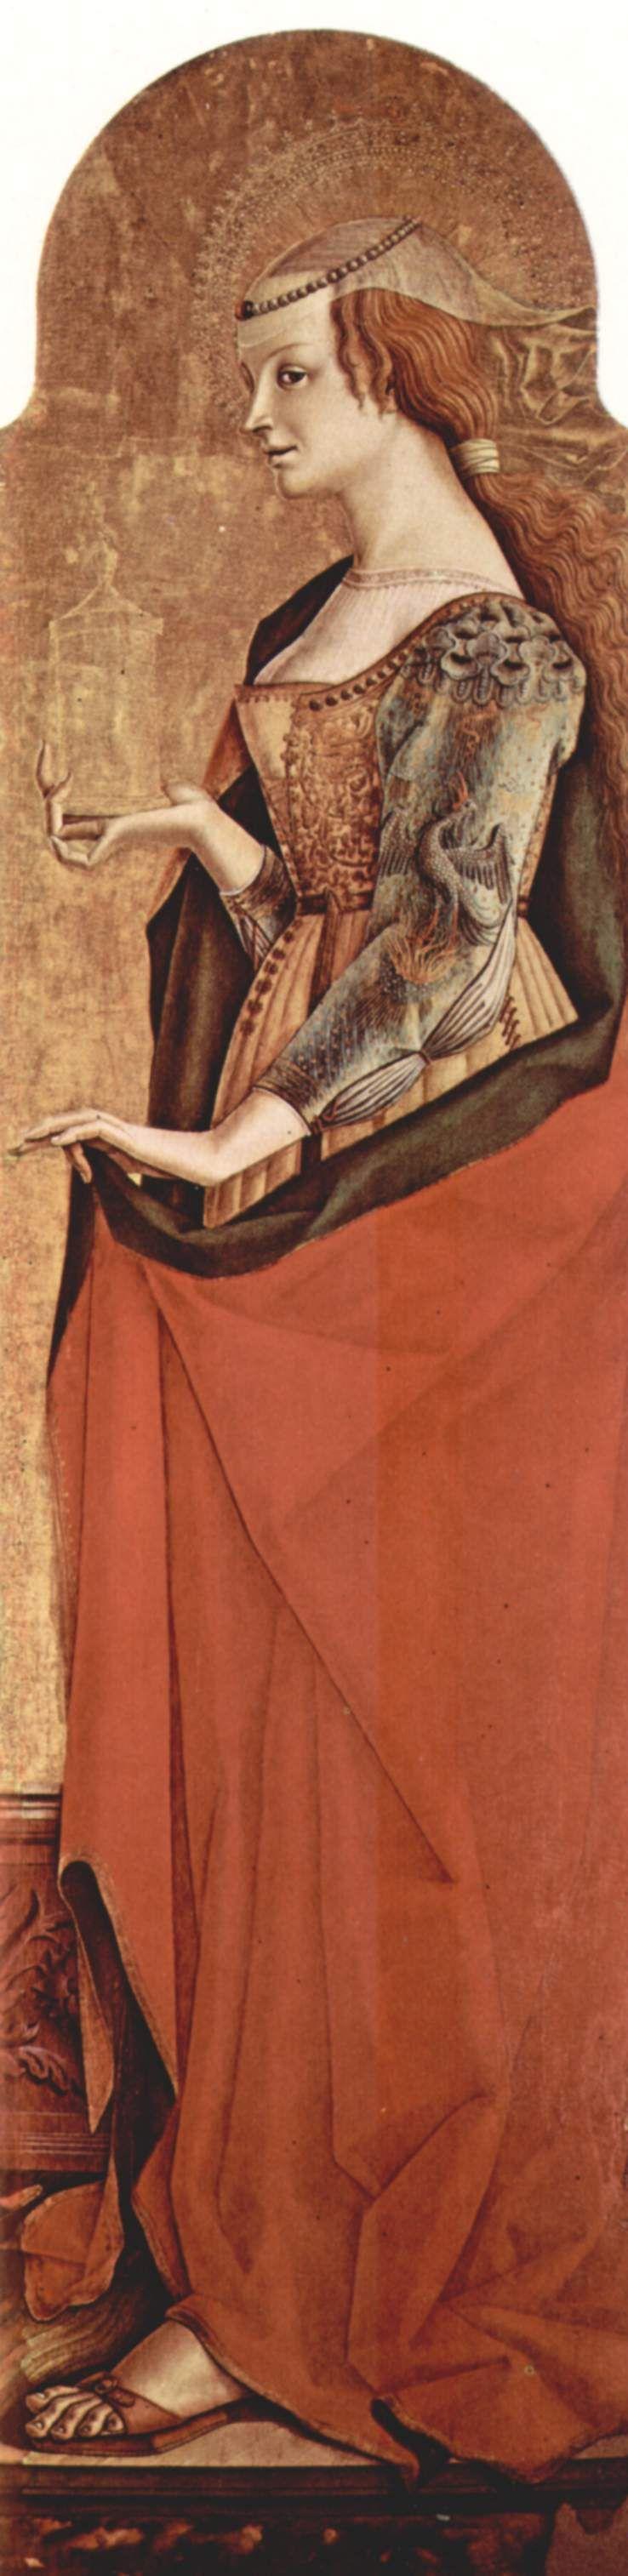 Saint Mary Magdalene Carlo Crivelli Wikiart Org Renaissance Fashion Italian Renaissance Dress Mary Magdalene